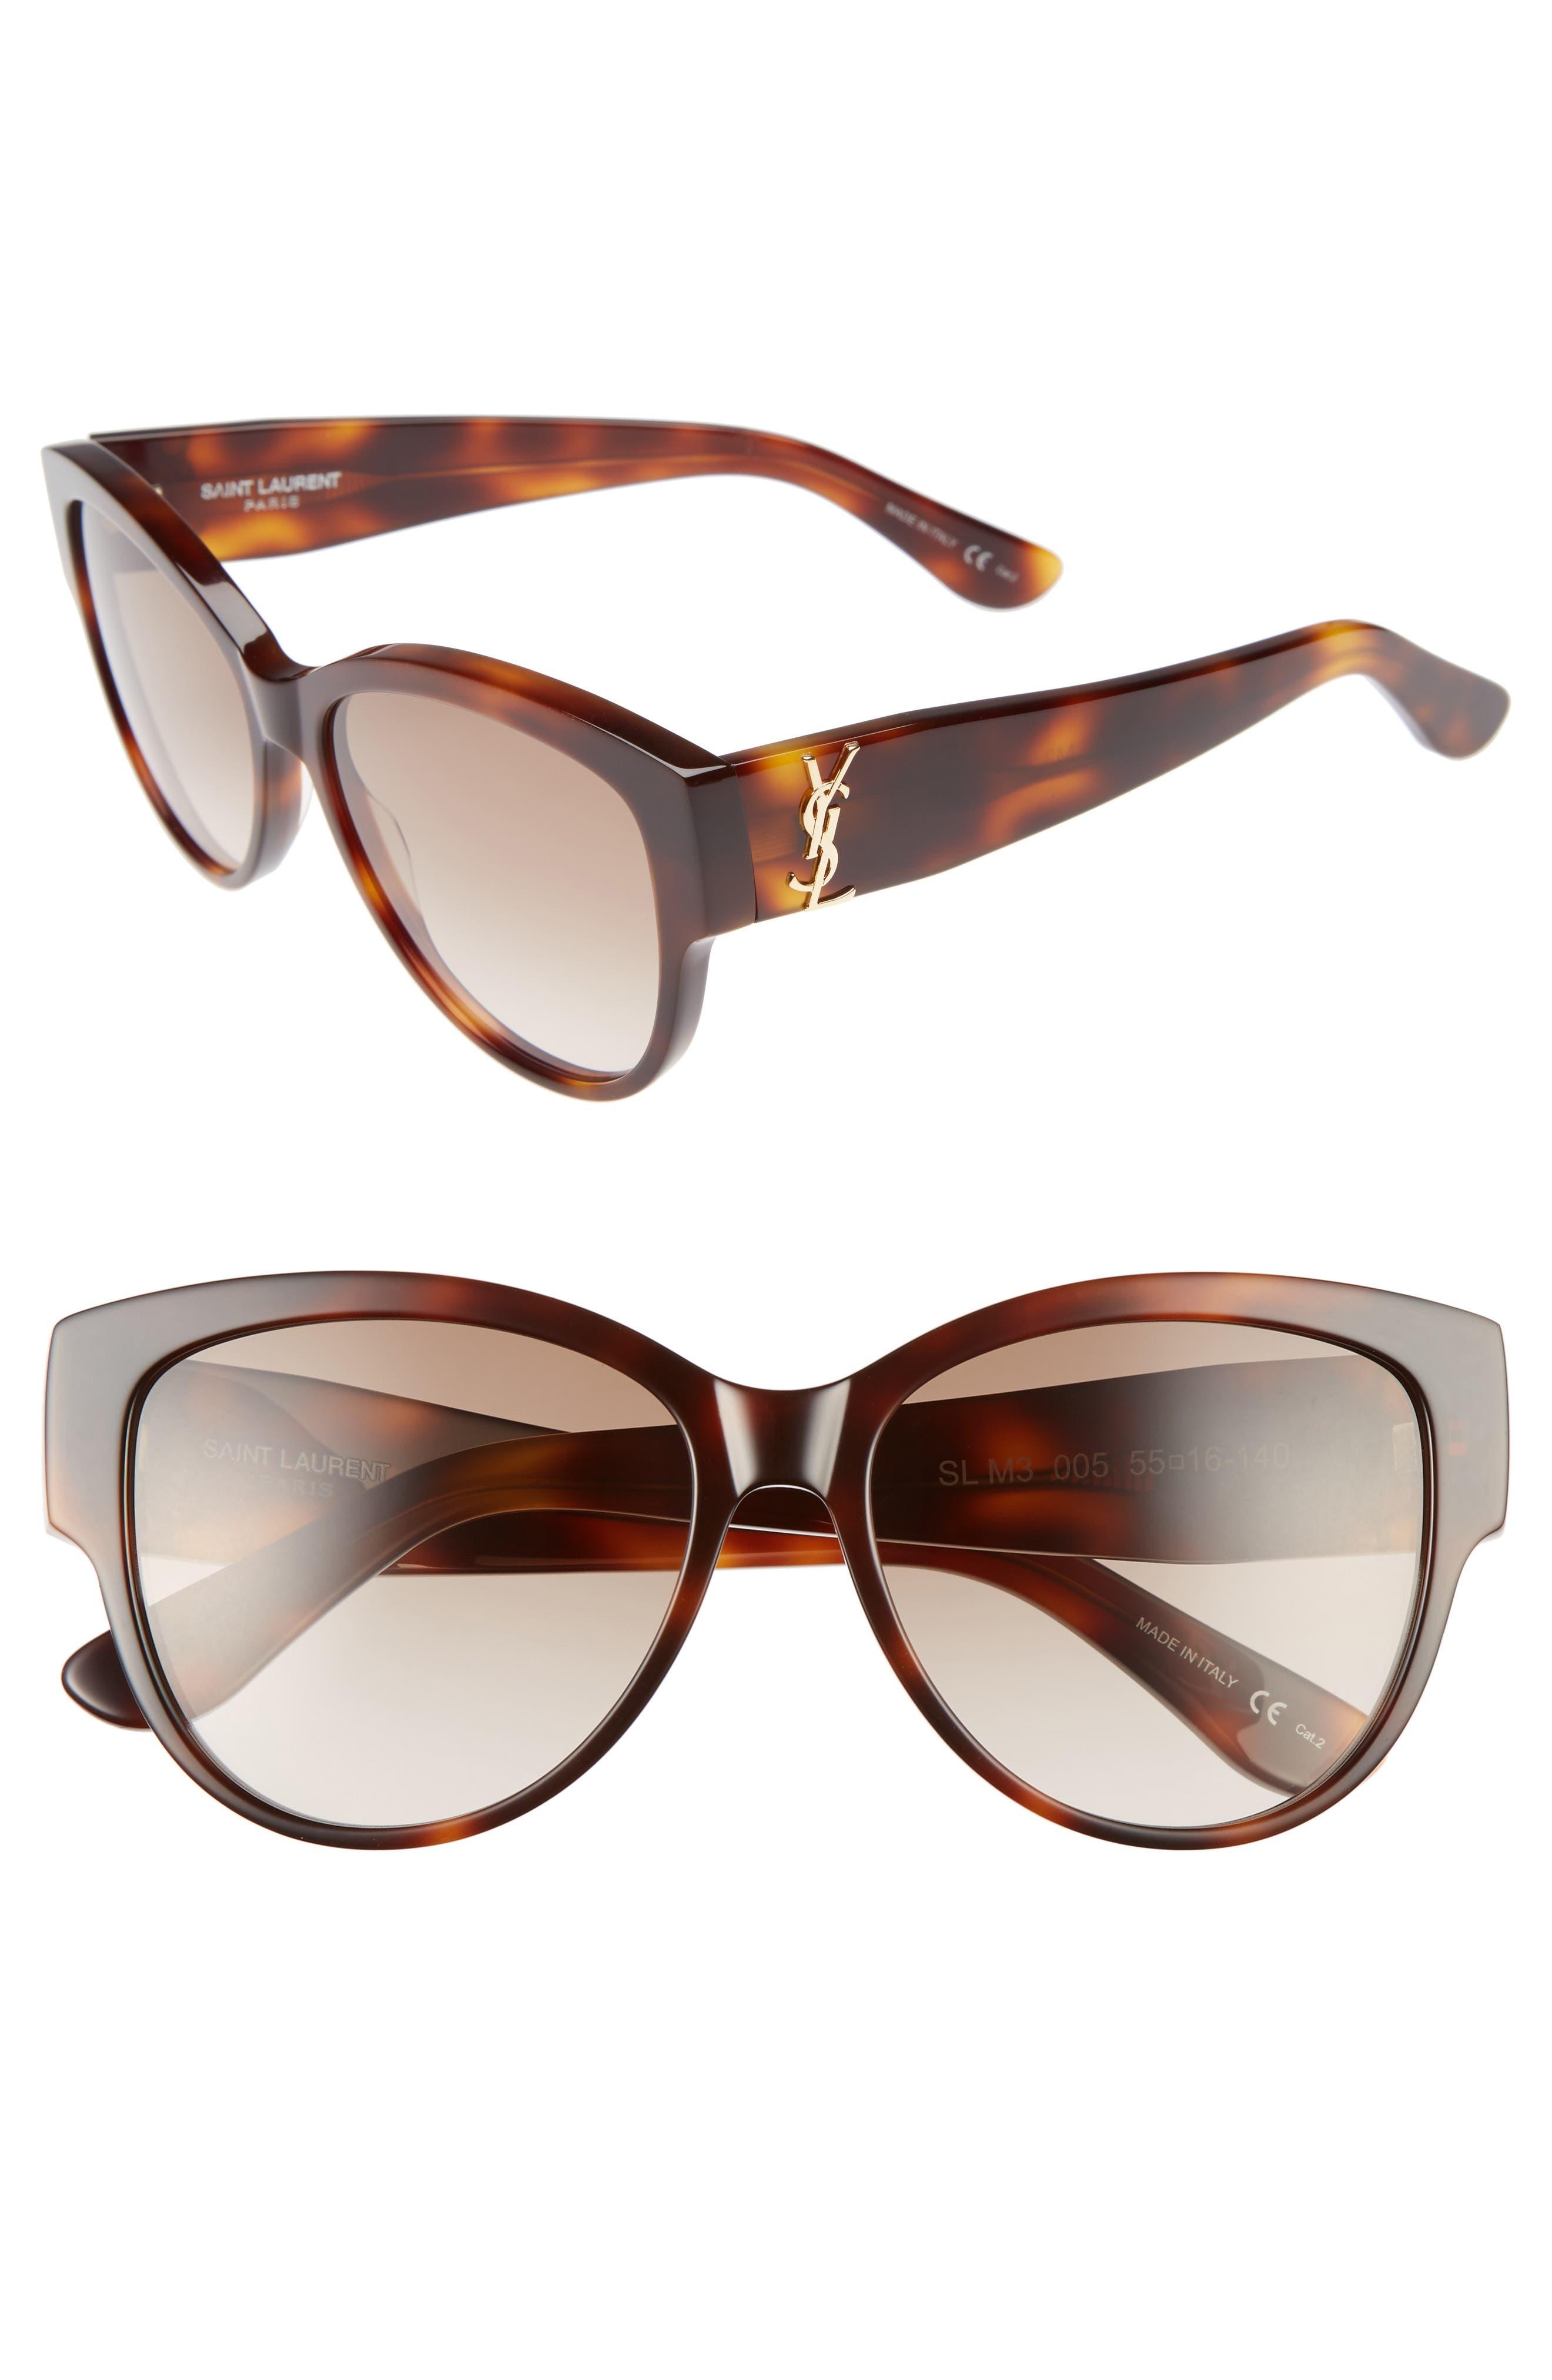 Main Image - Saint Laurent 55mm Cat Eye Sunglasses